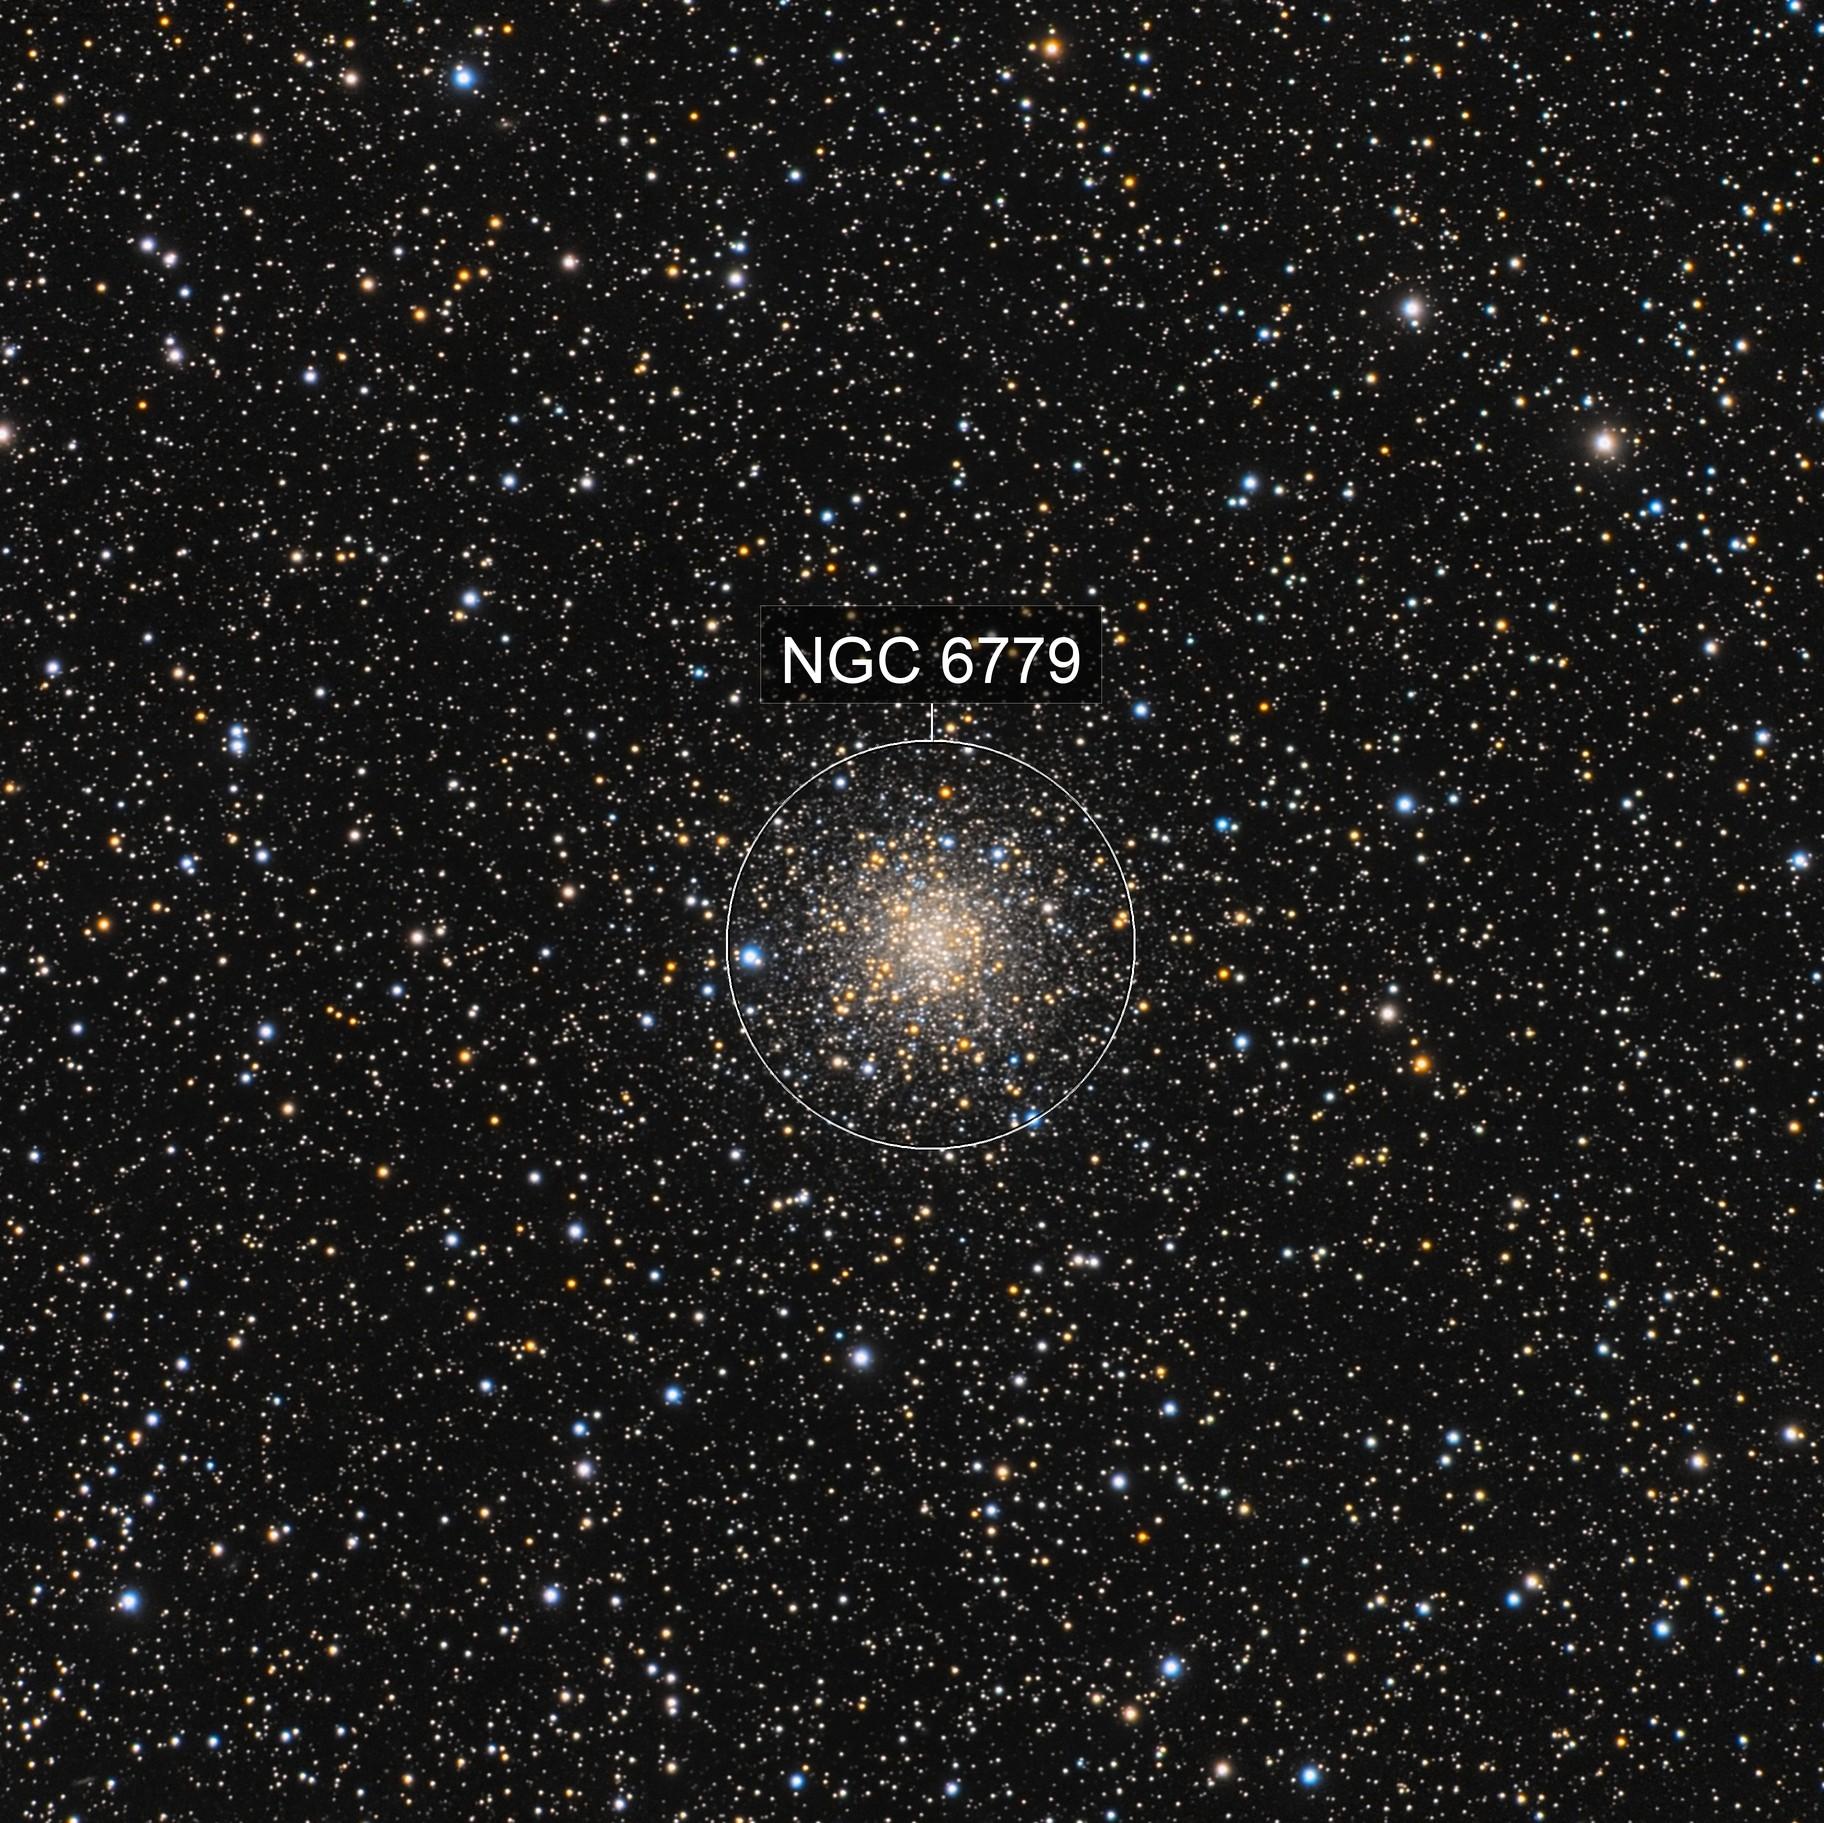 M56 (NGC 6779) - Globular Cluster in Lyra